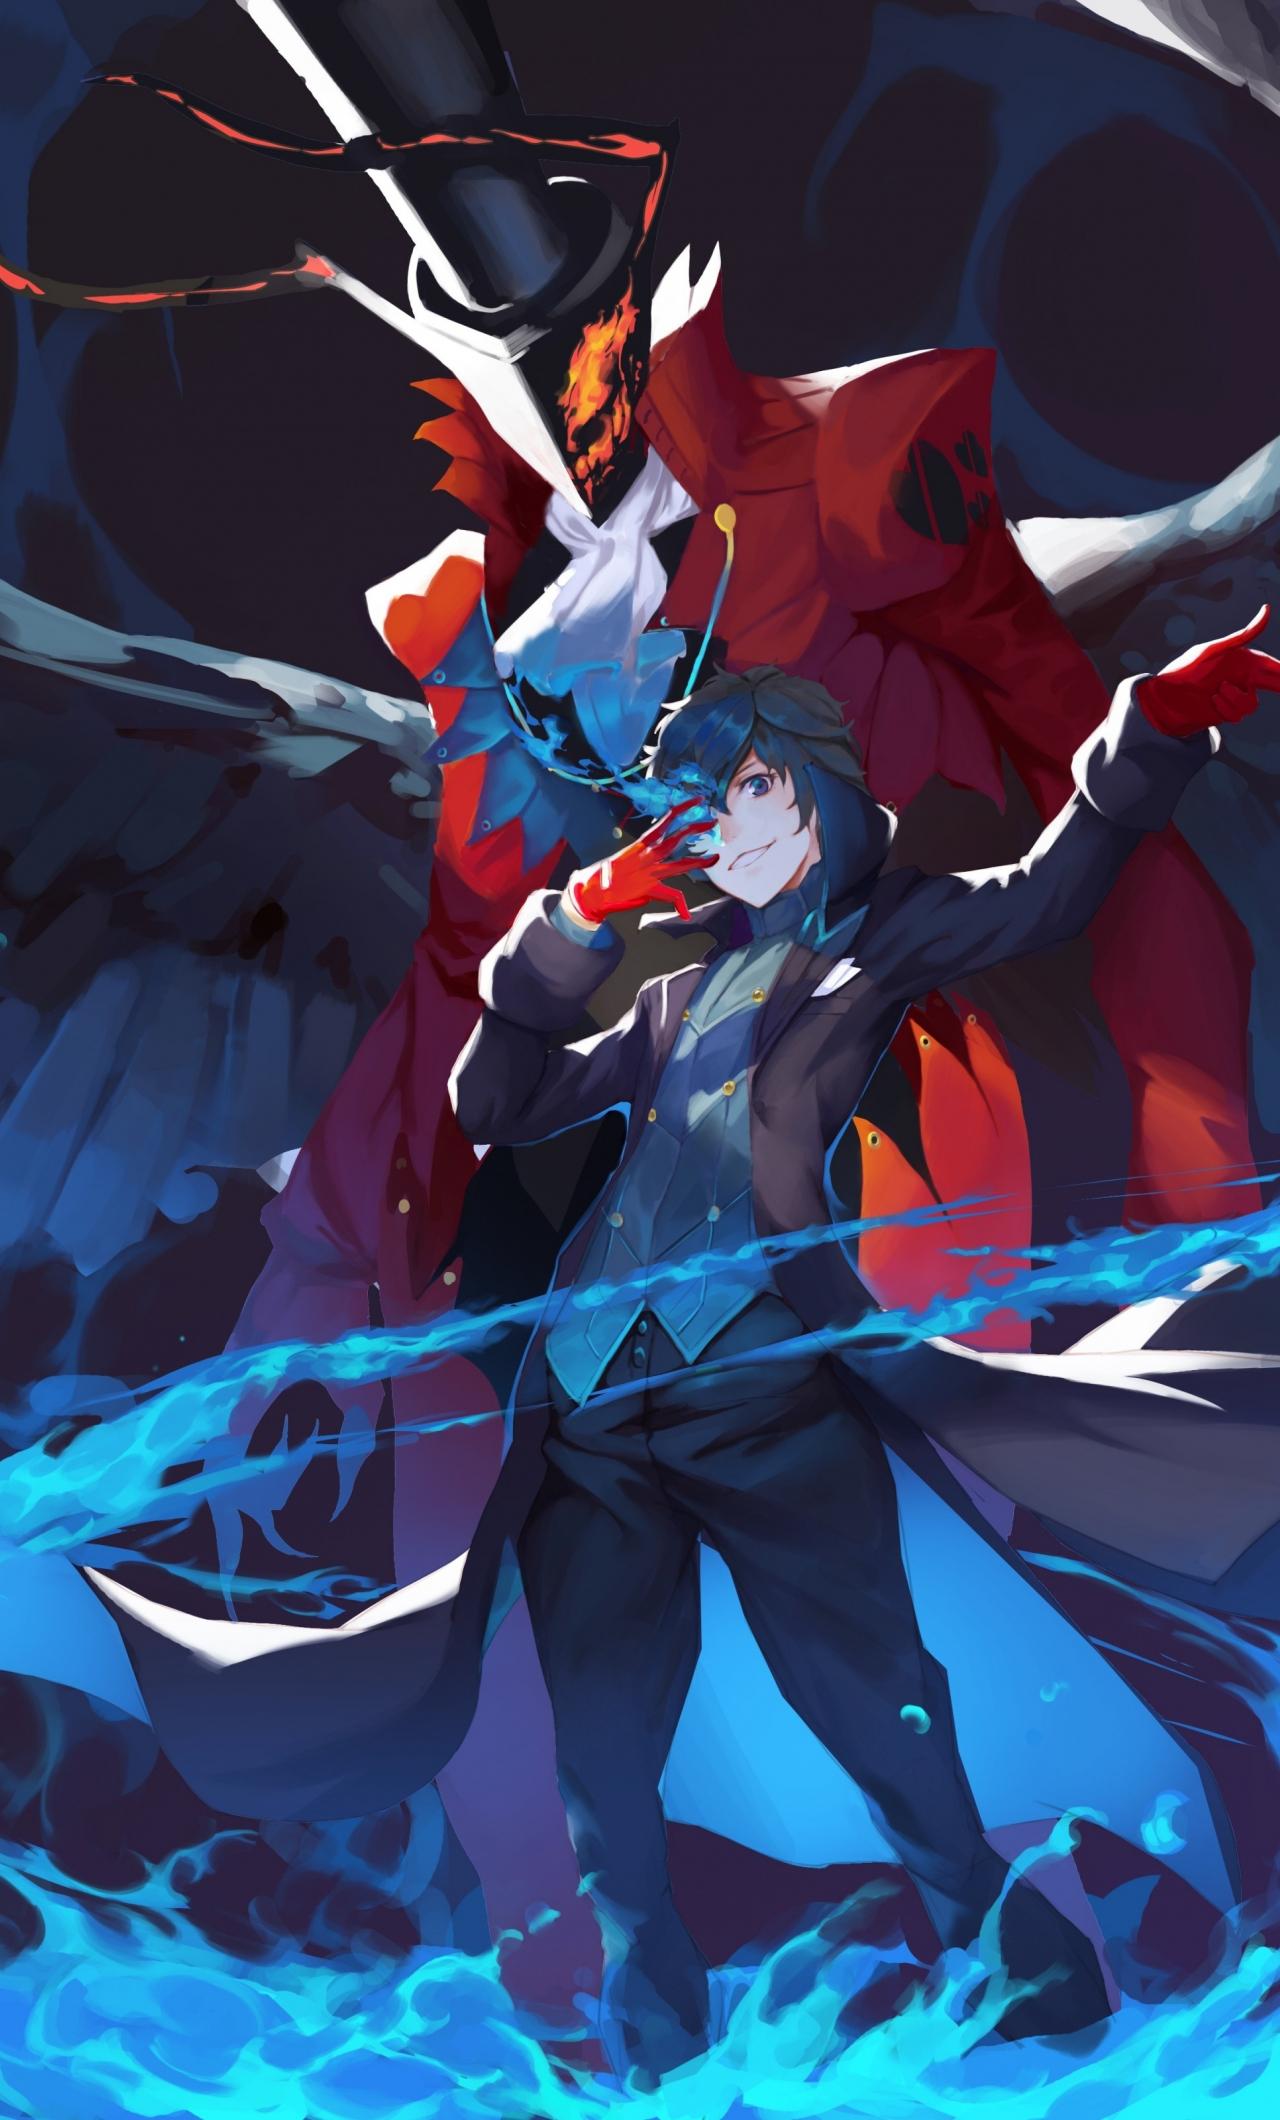 Download 1280x2120 Wallpaper Akira Kurusu Persona 5 Anime Video